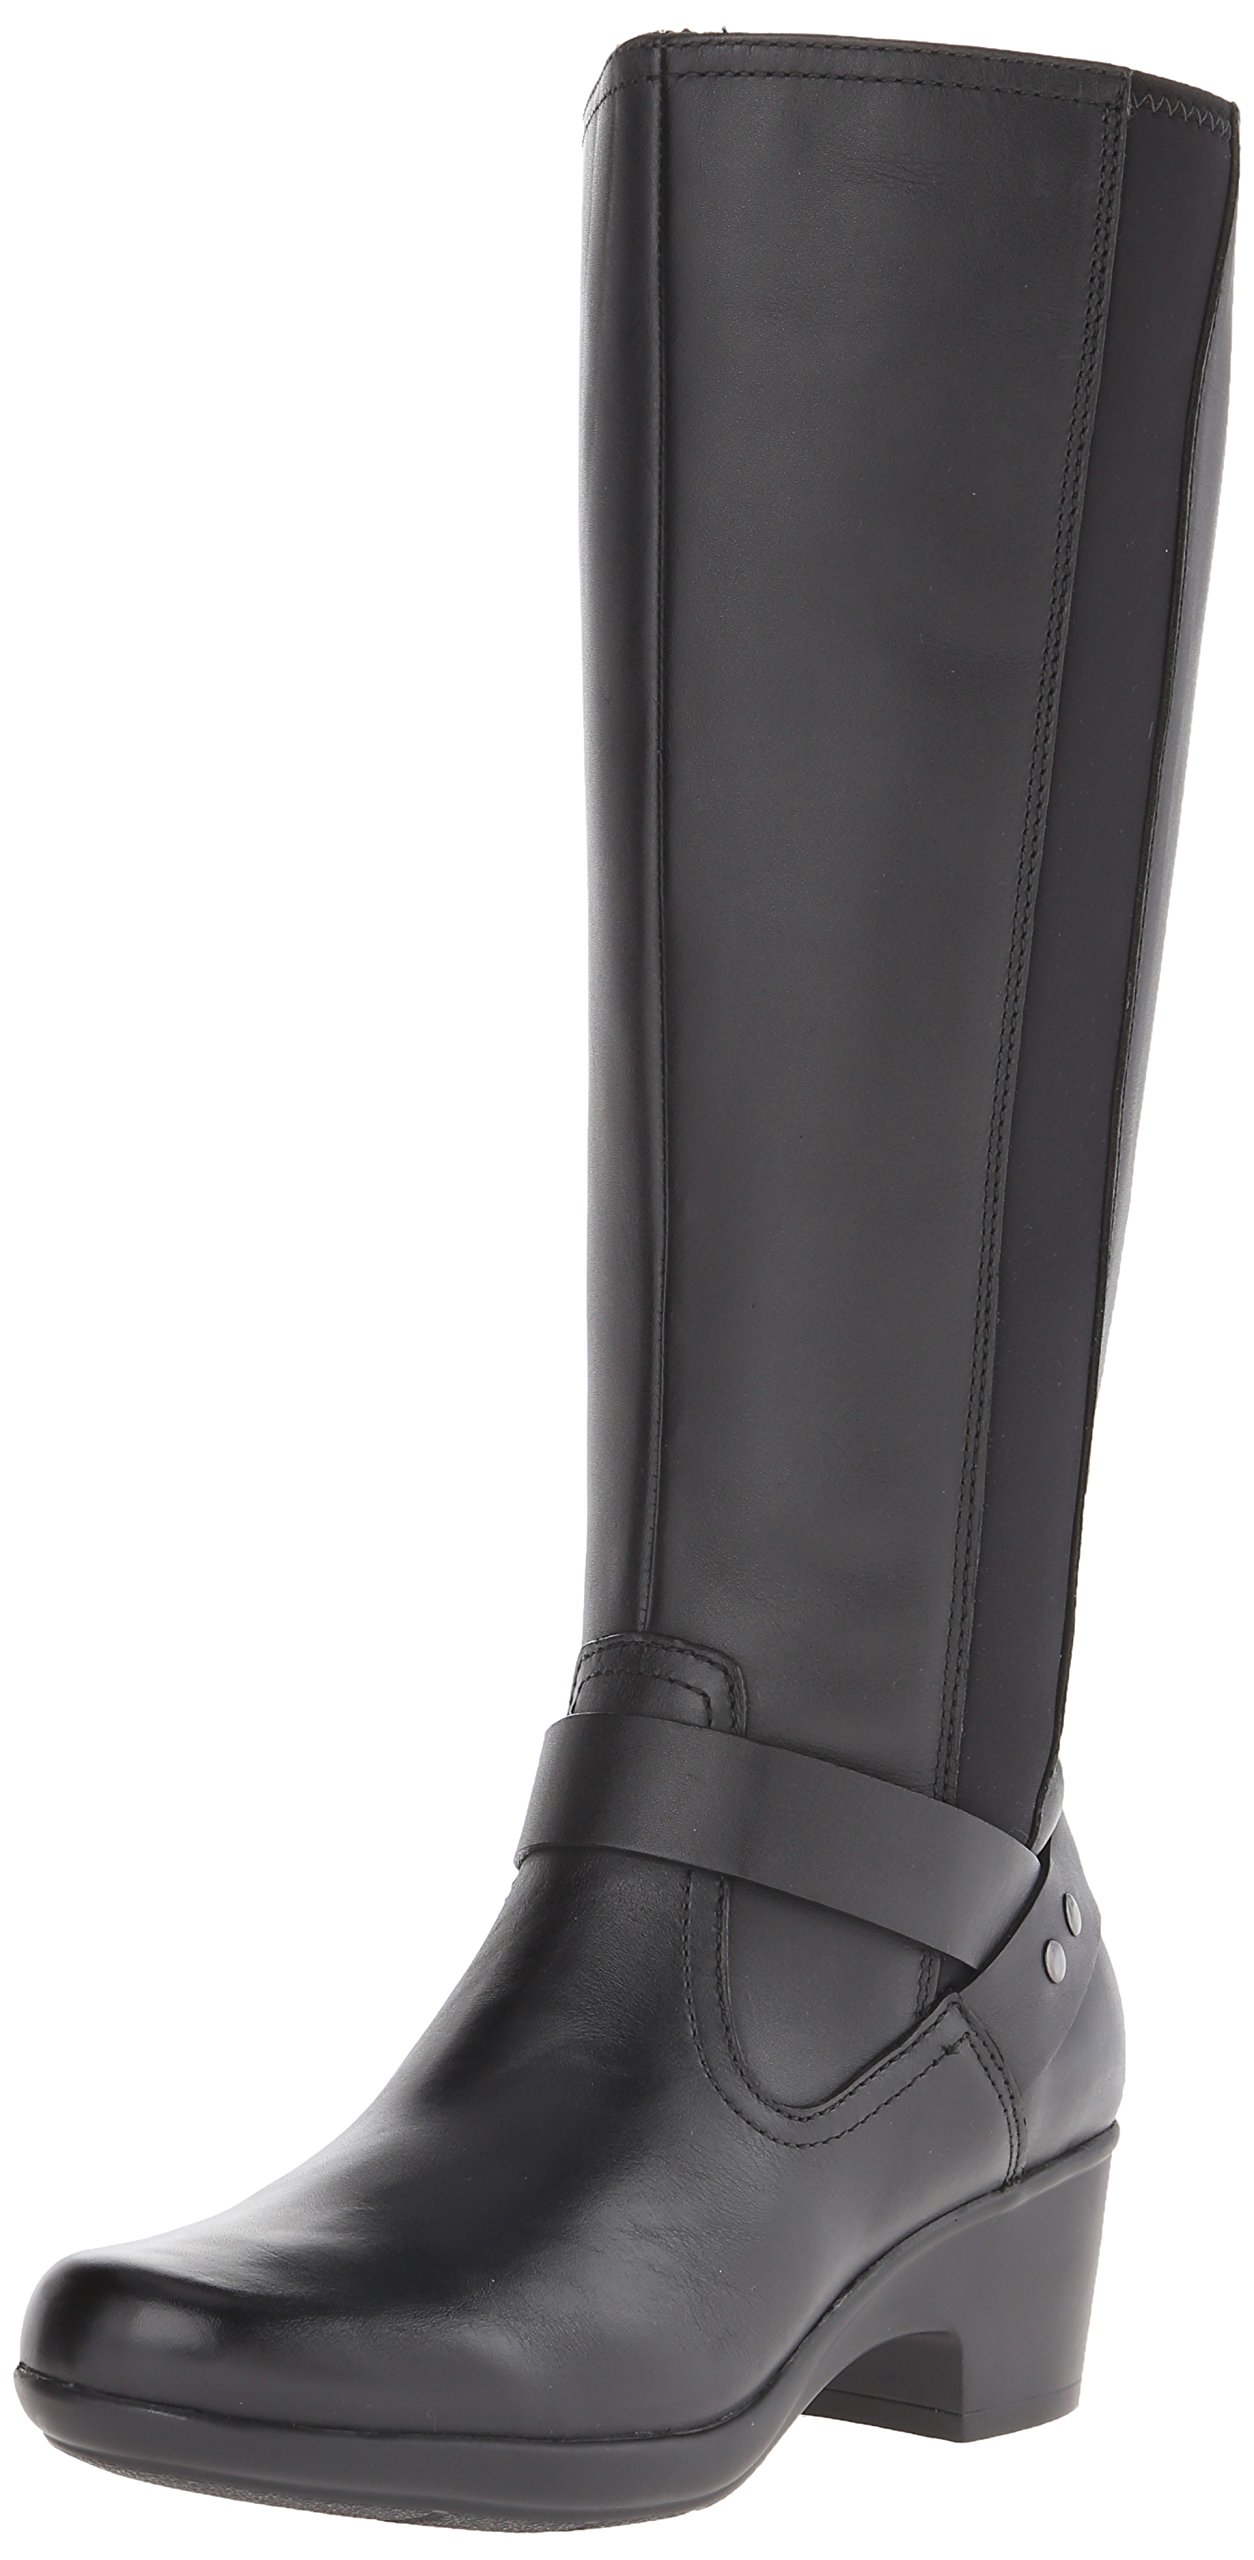 CLARKS Women's Malia Willo Riding Boot, Black Leather, 7 M US